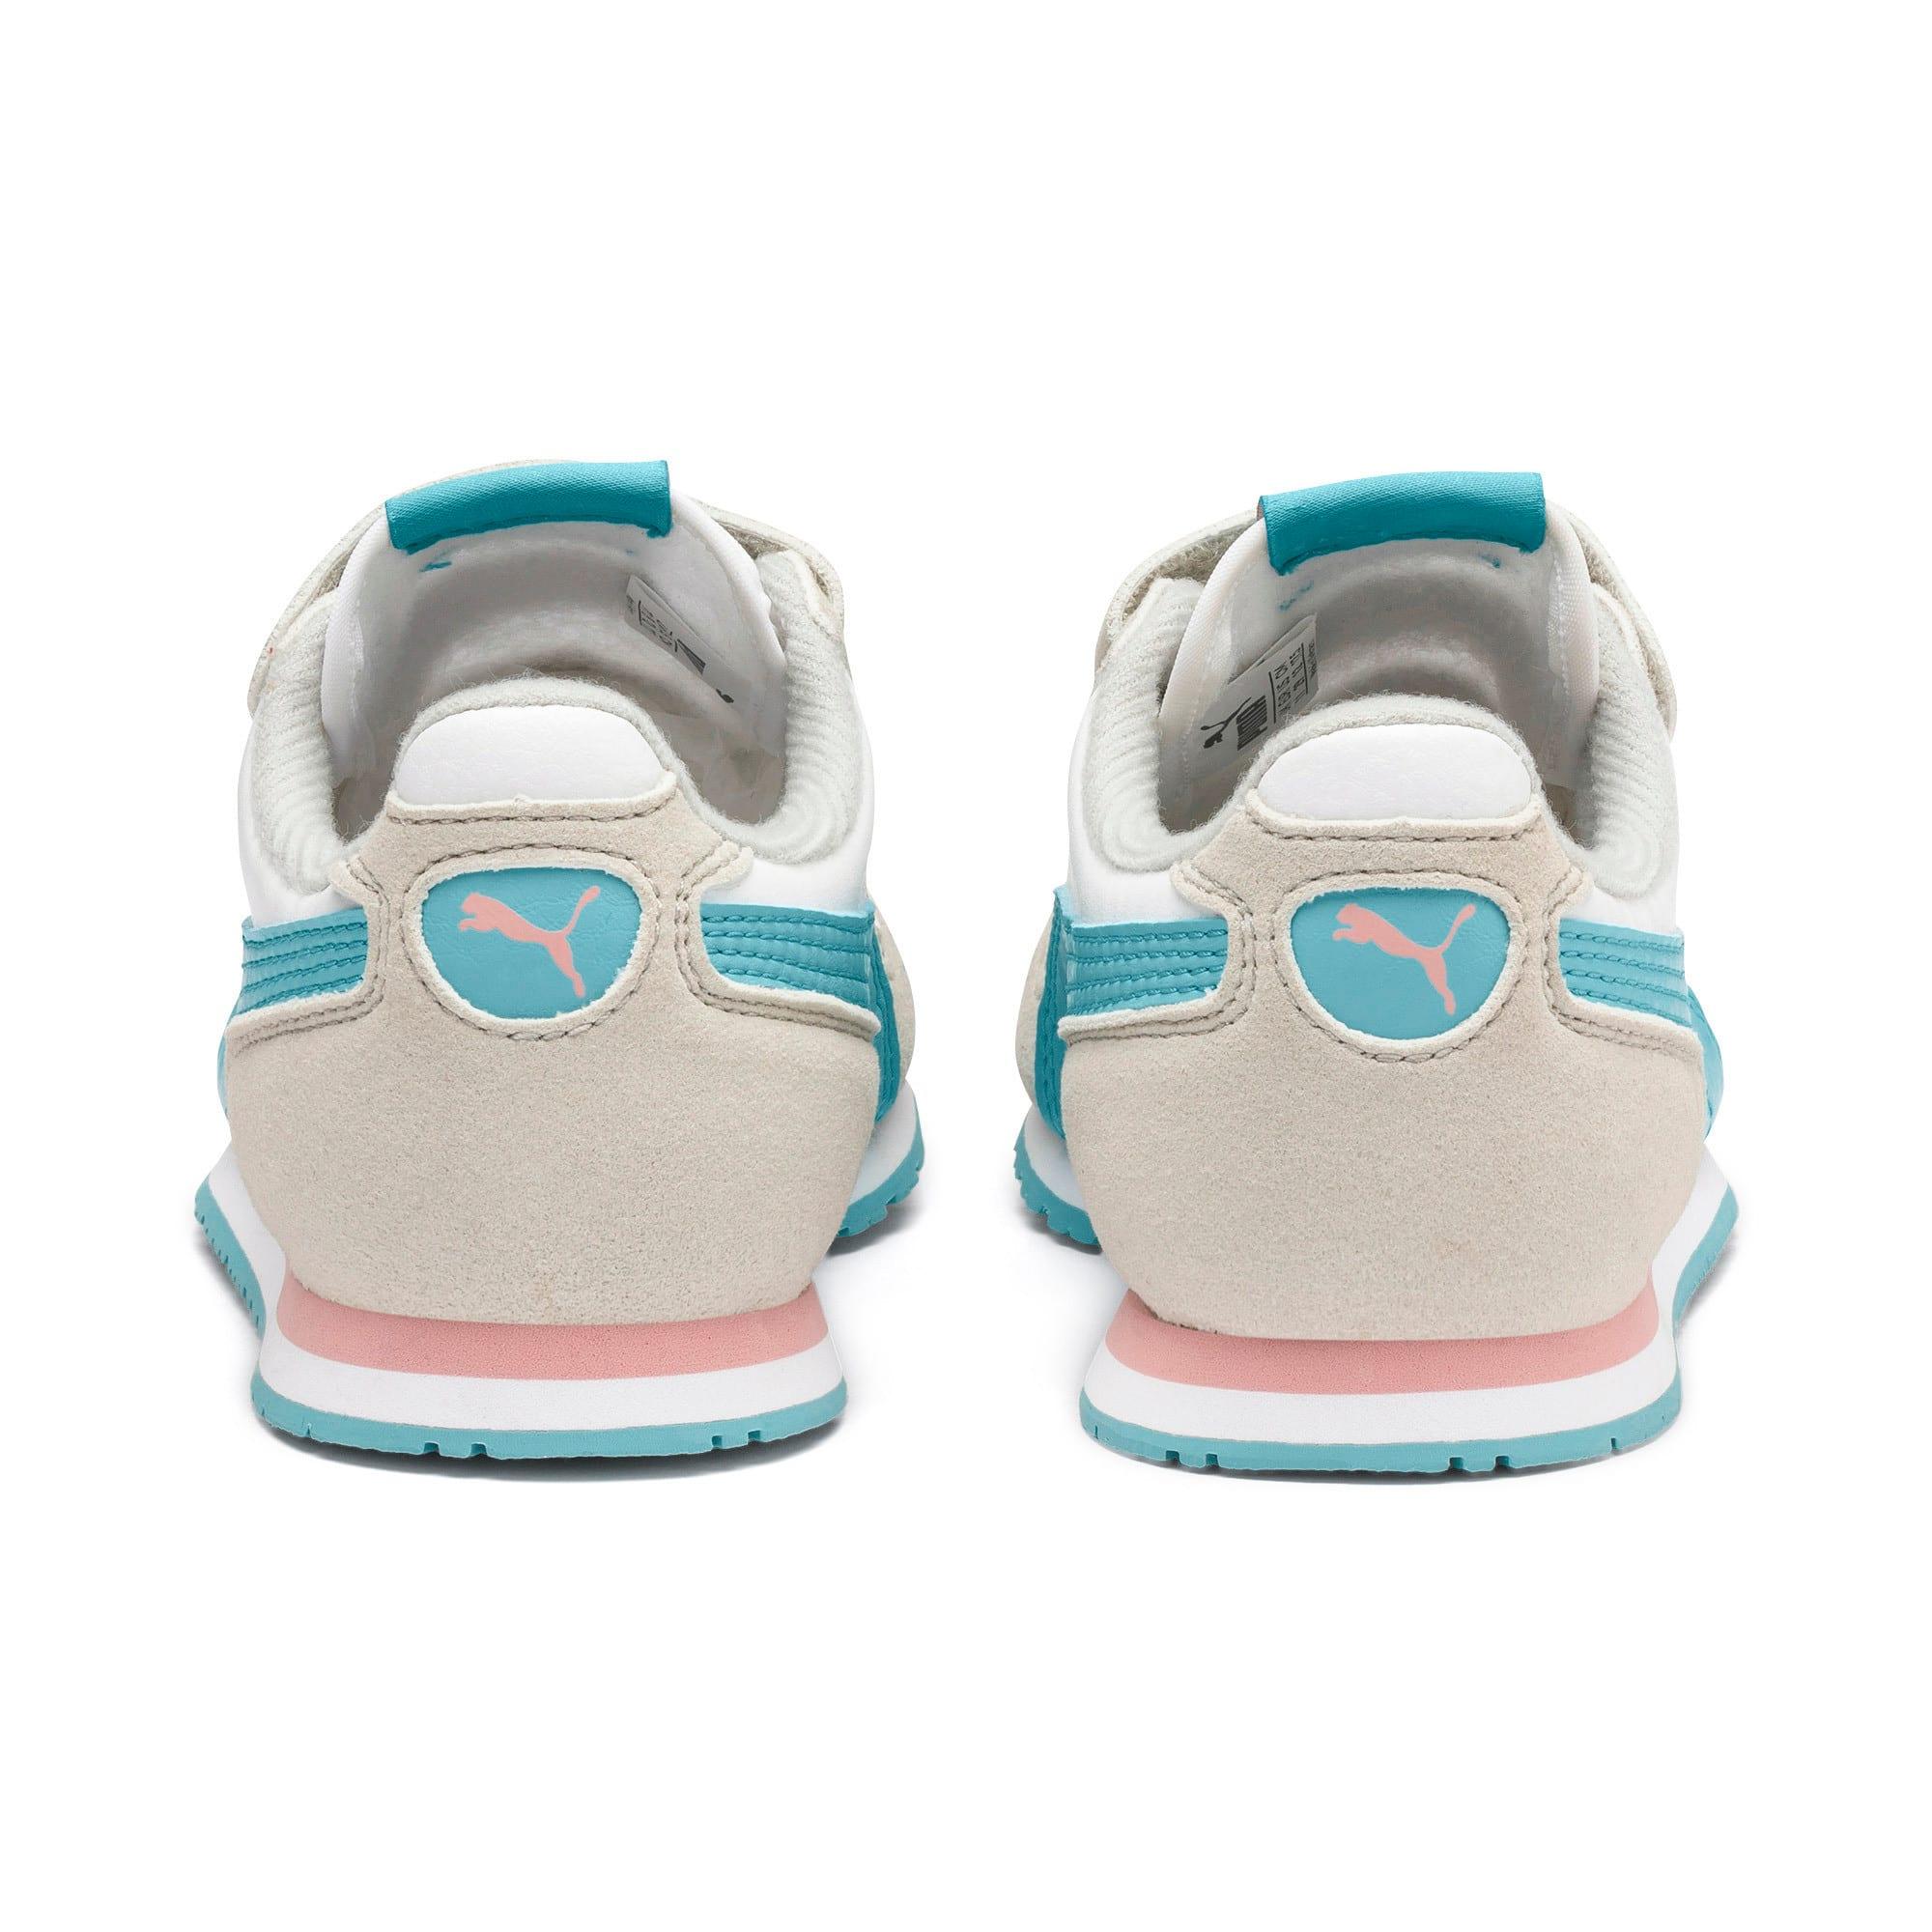 Thumbnail 3 of Cabana Racer SL V PS Baby Sneaker, Puma White-Milky Blue, medium